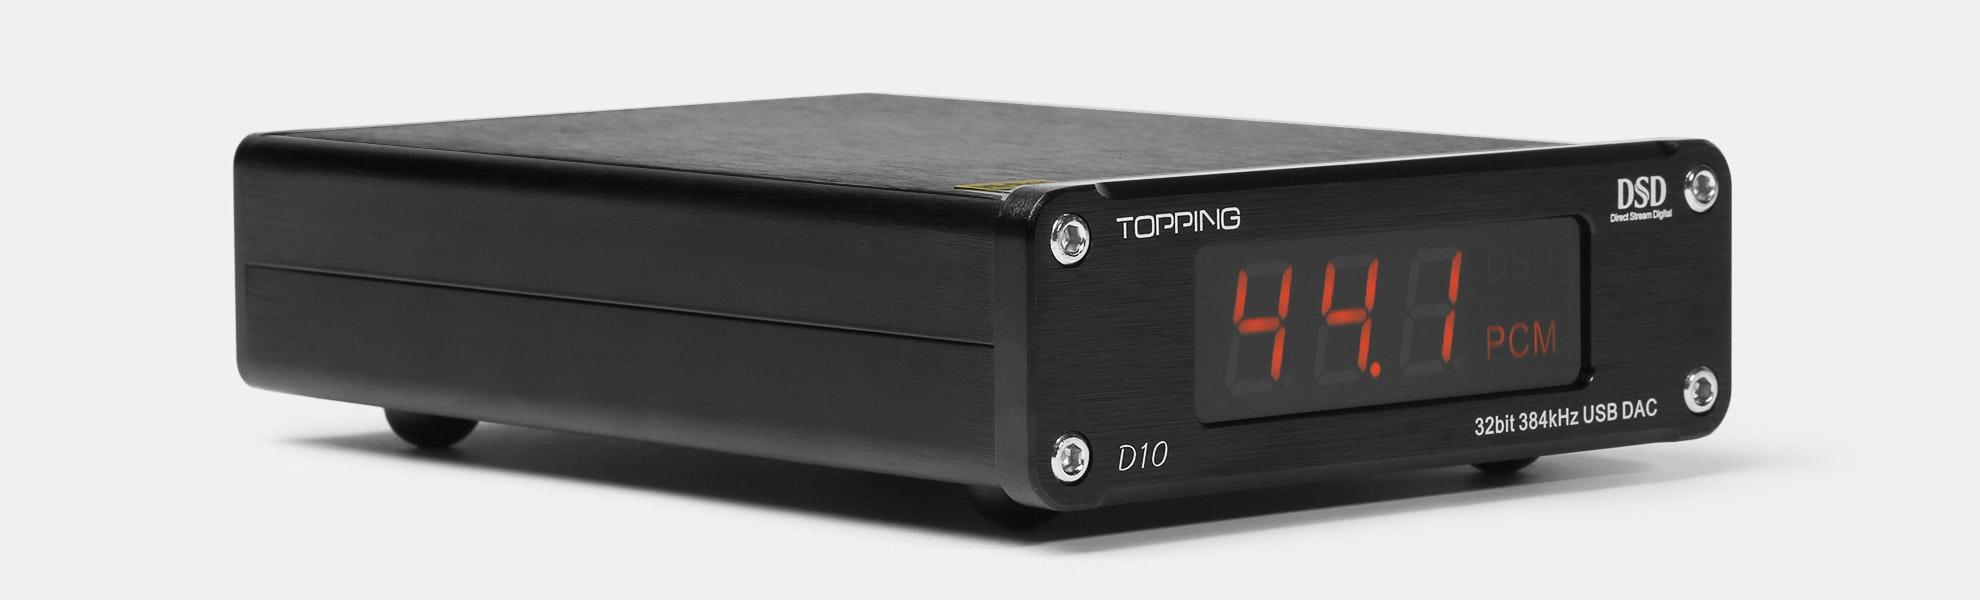 Topping D10 DAC